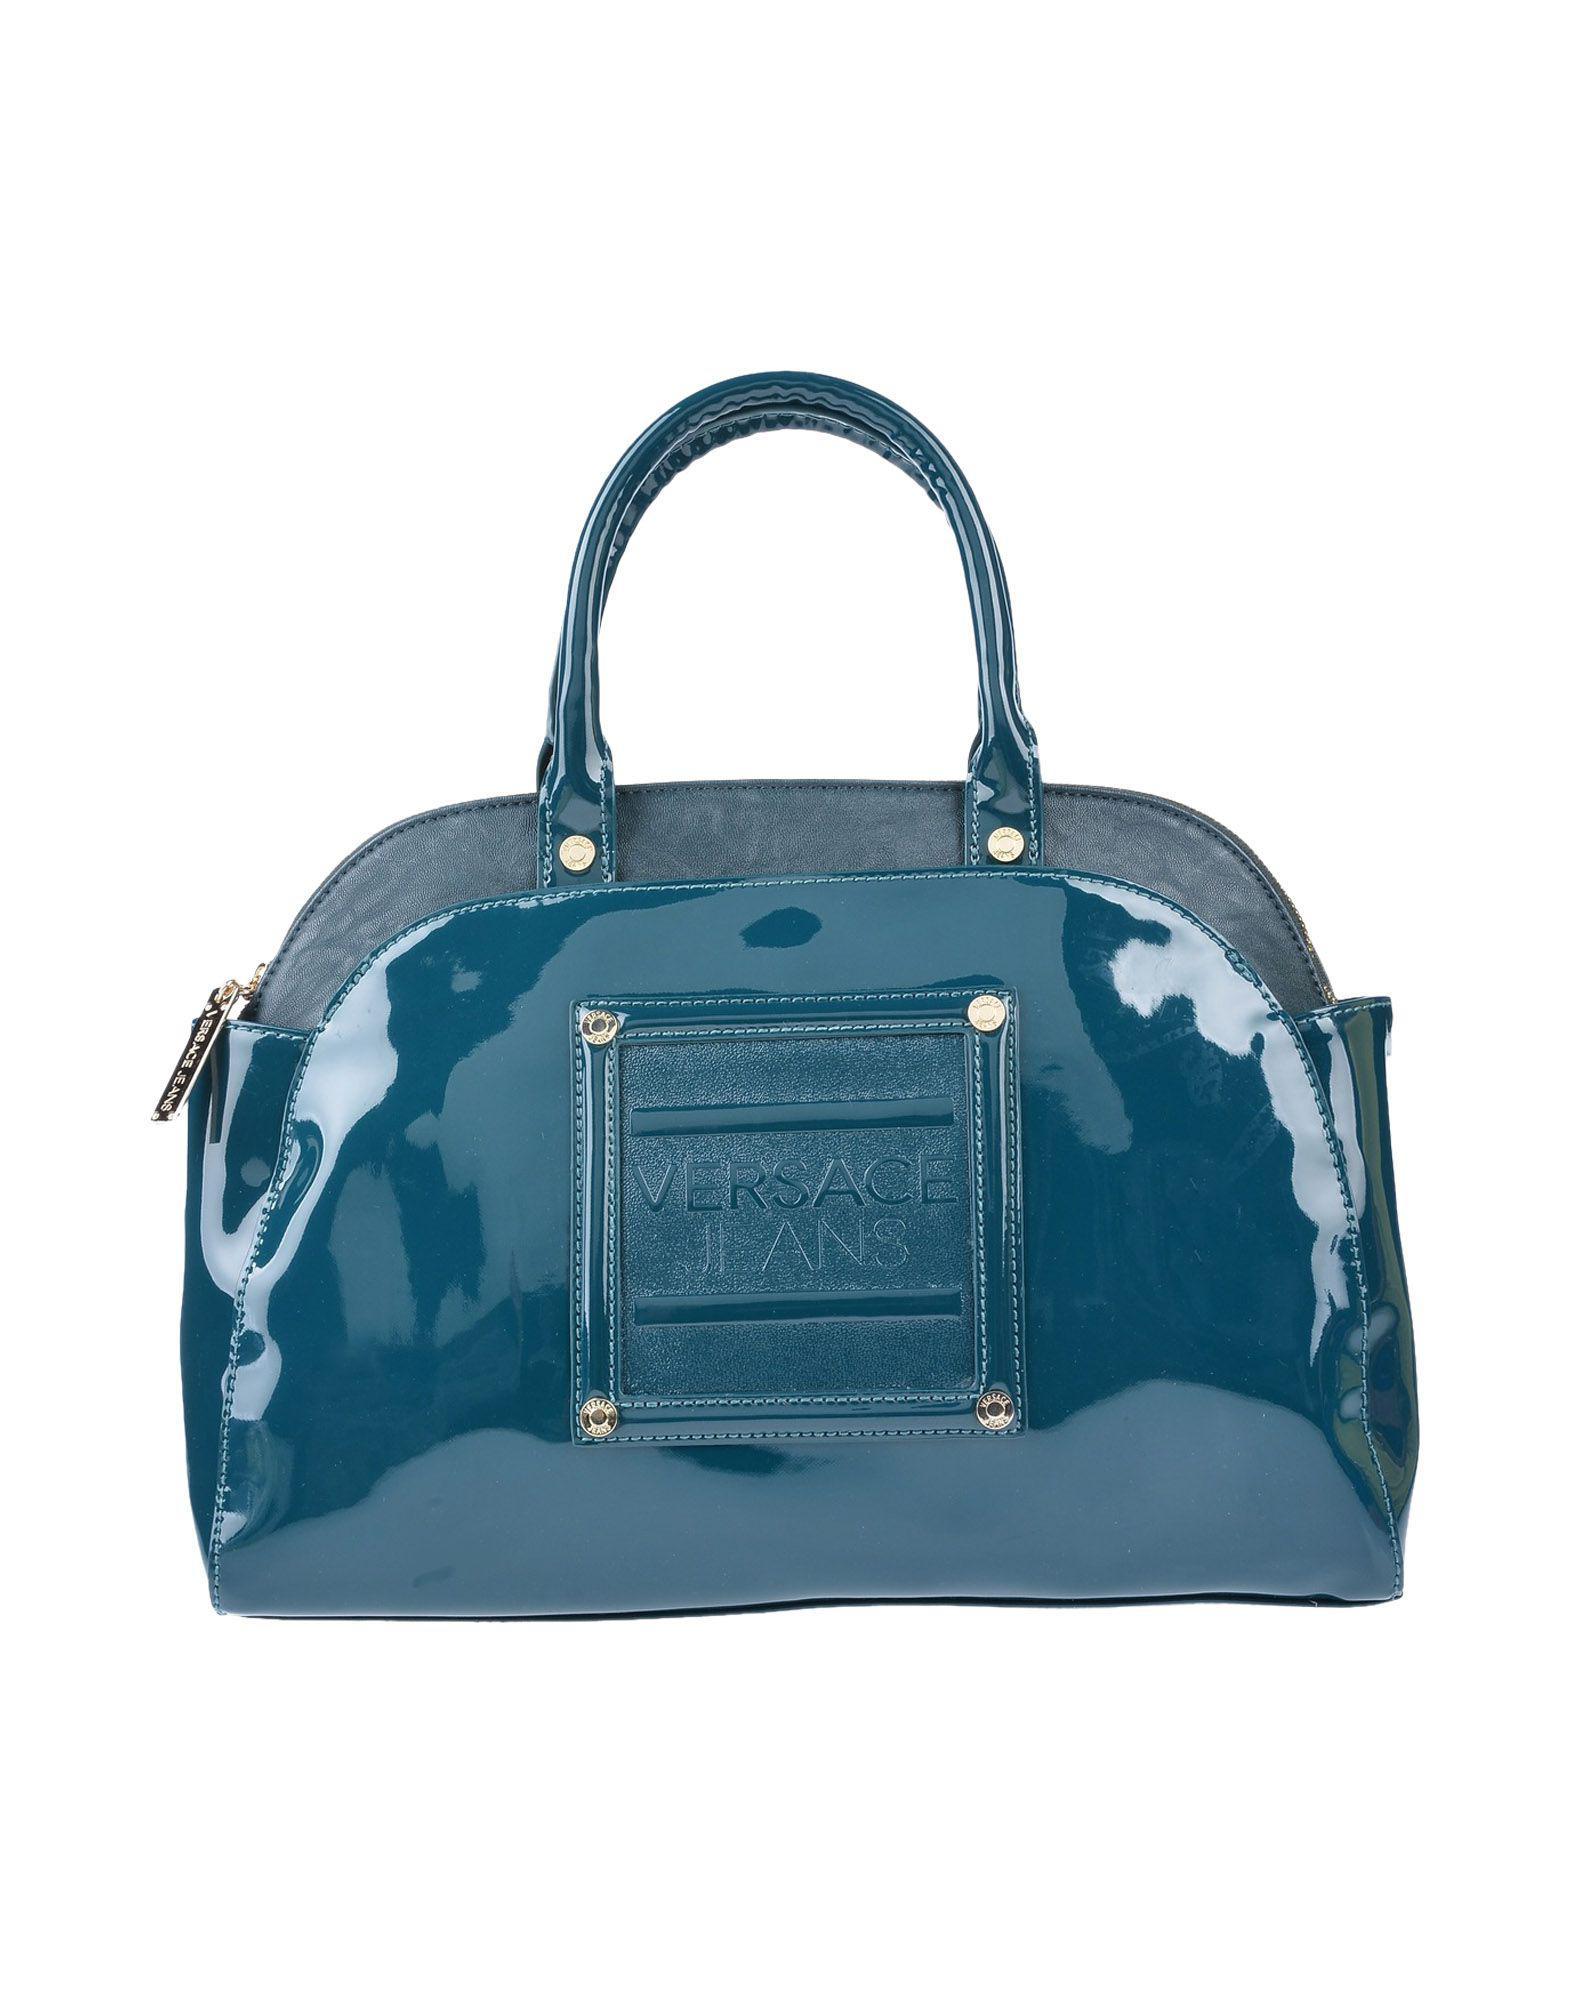 3408f787732d Versace Jeans Handbag in Blue - Lyst